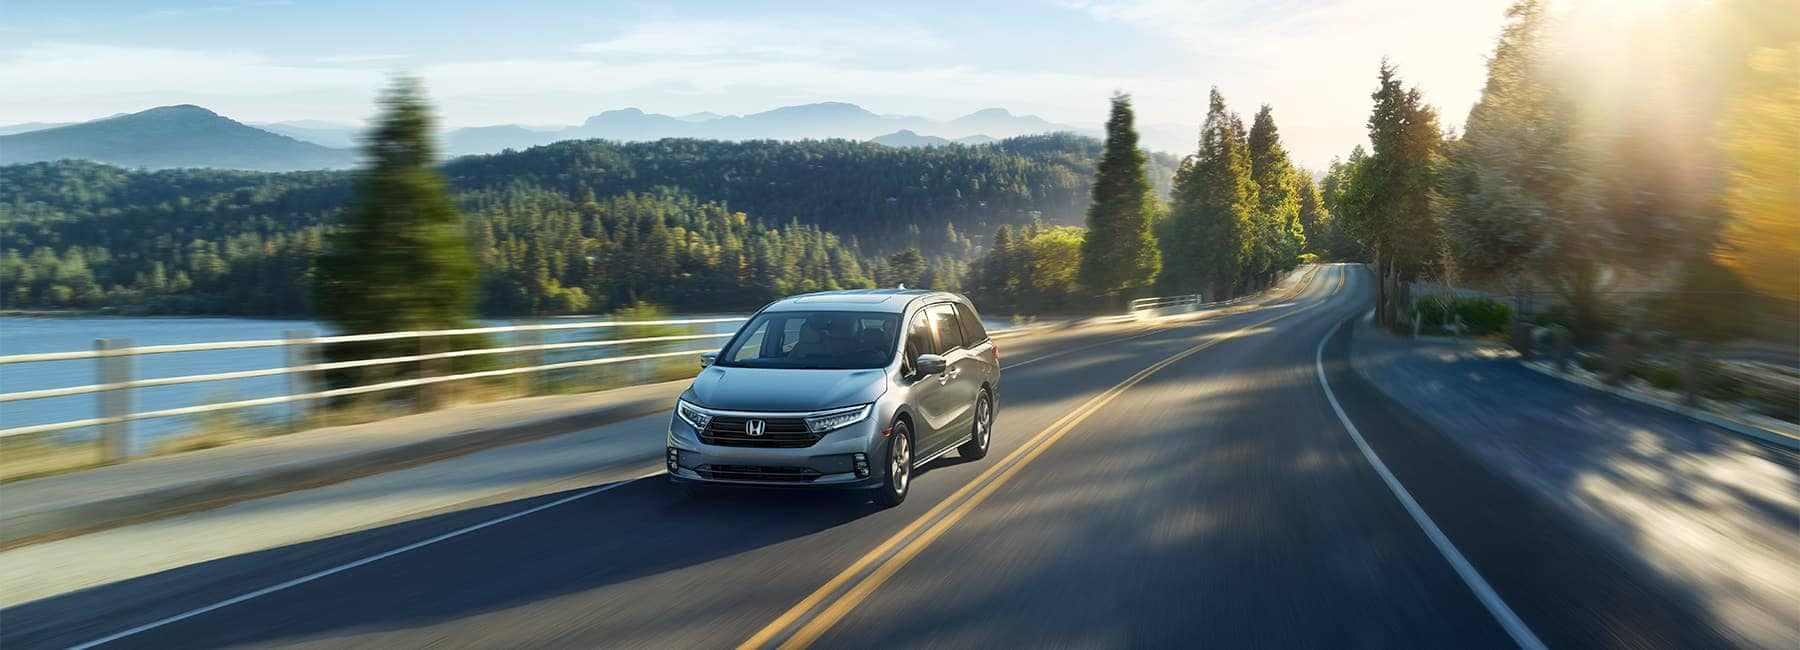 2021 Honda Odyssey drives on mountain road